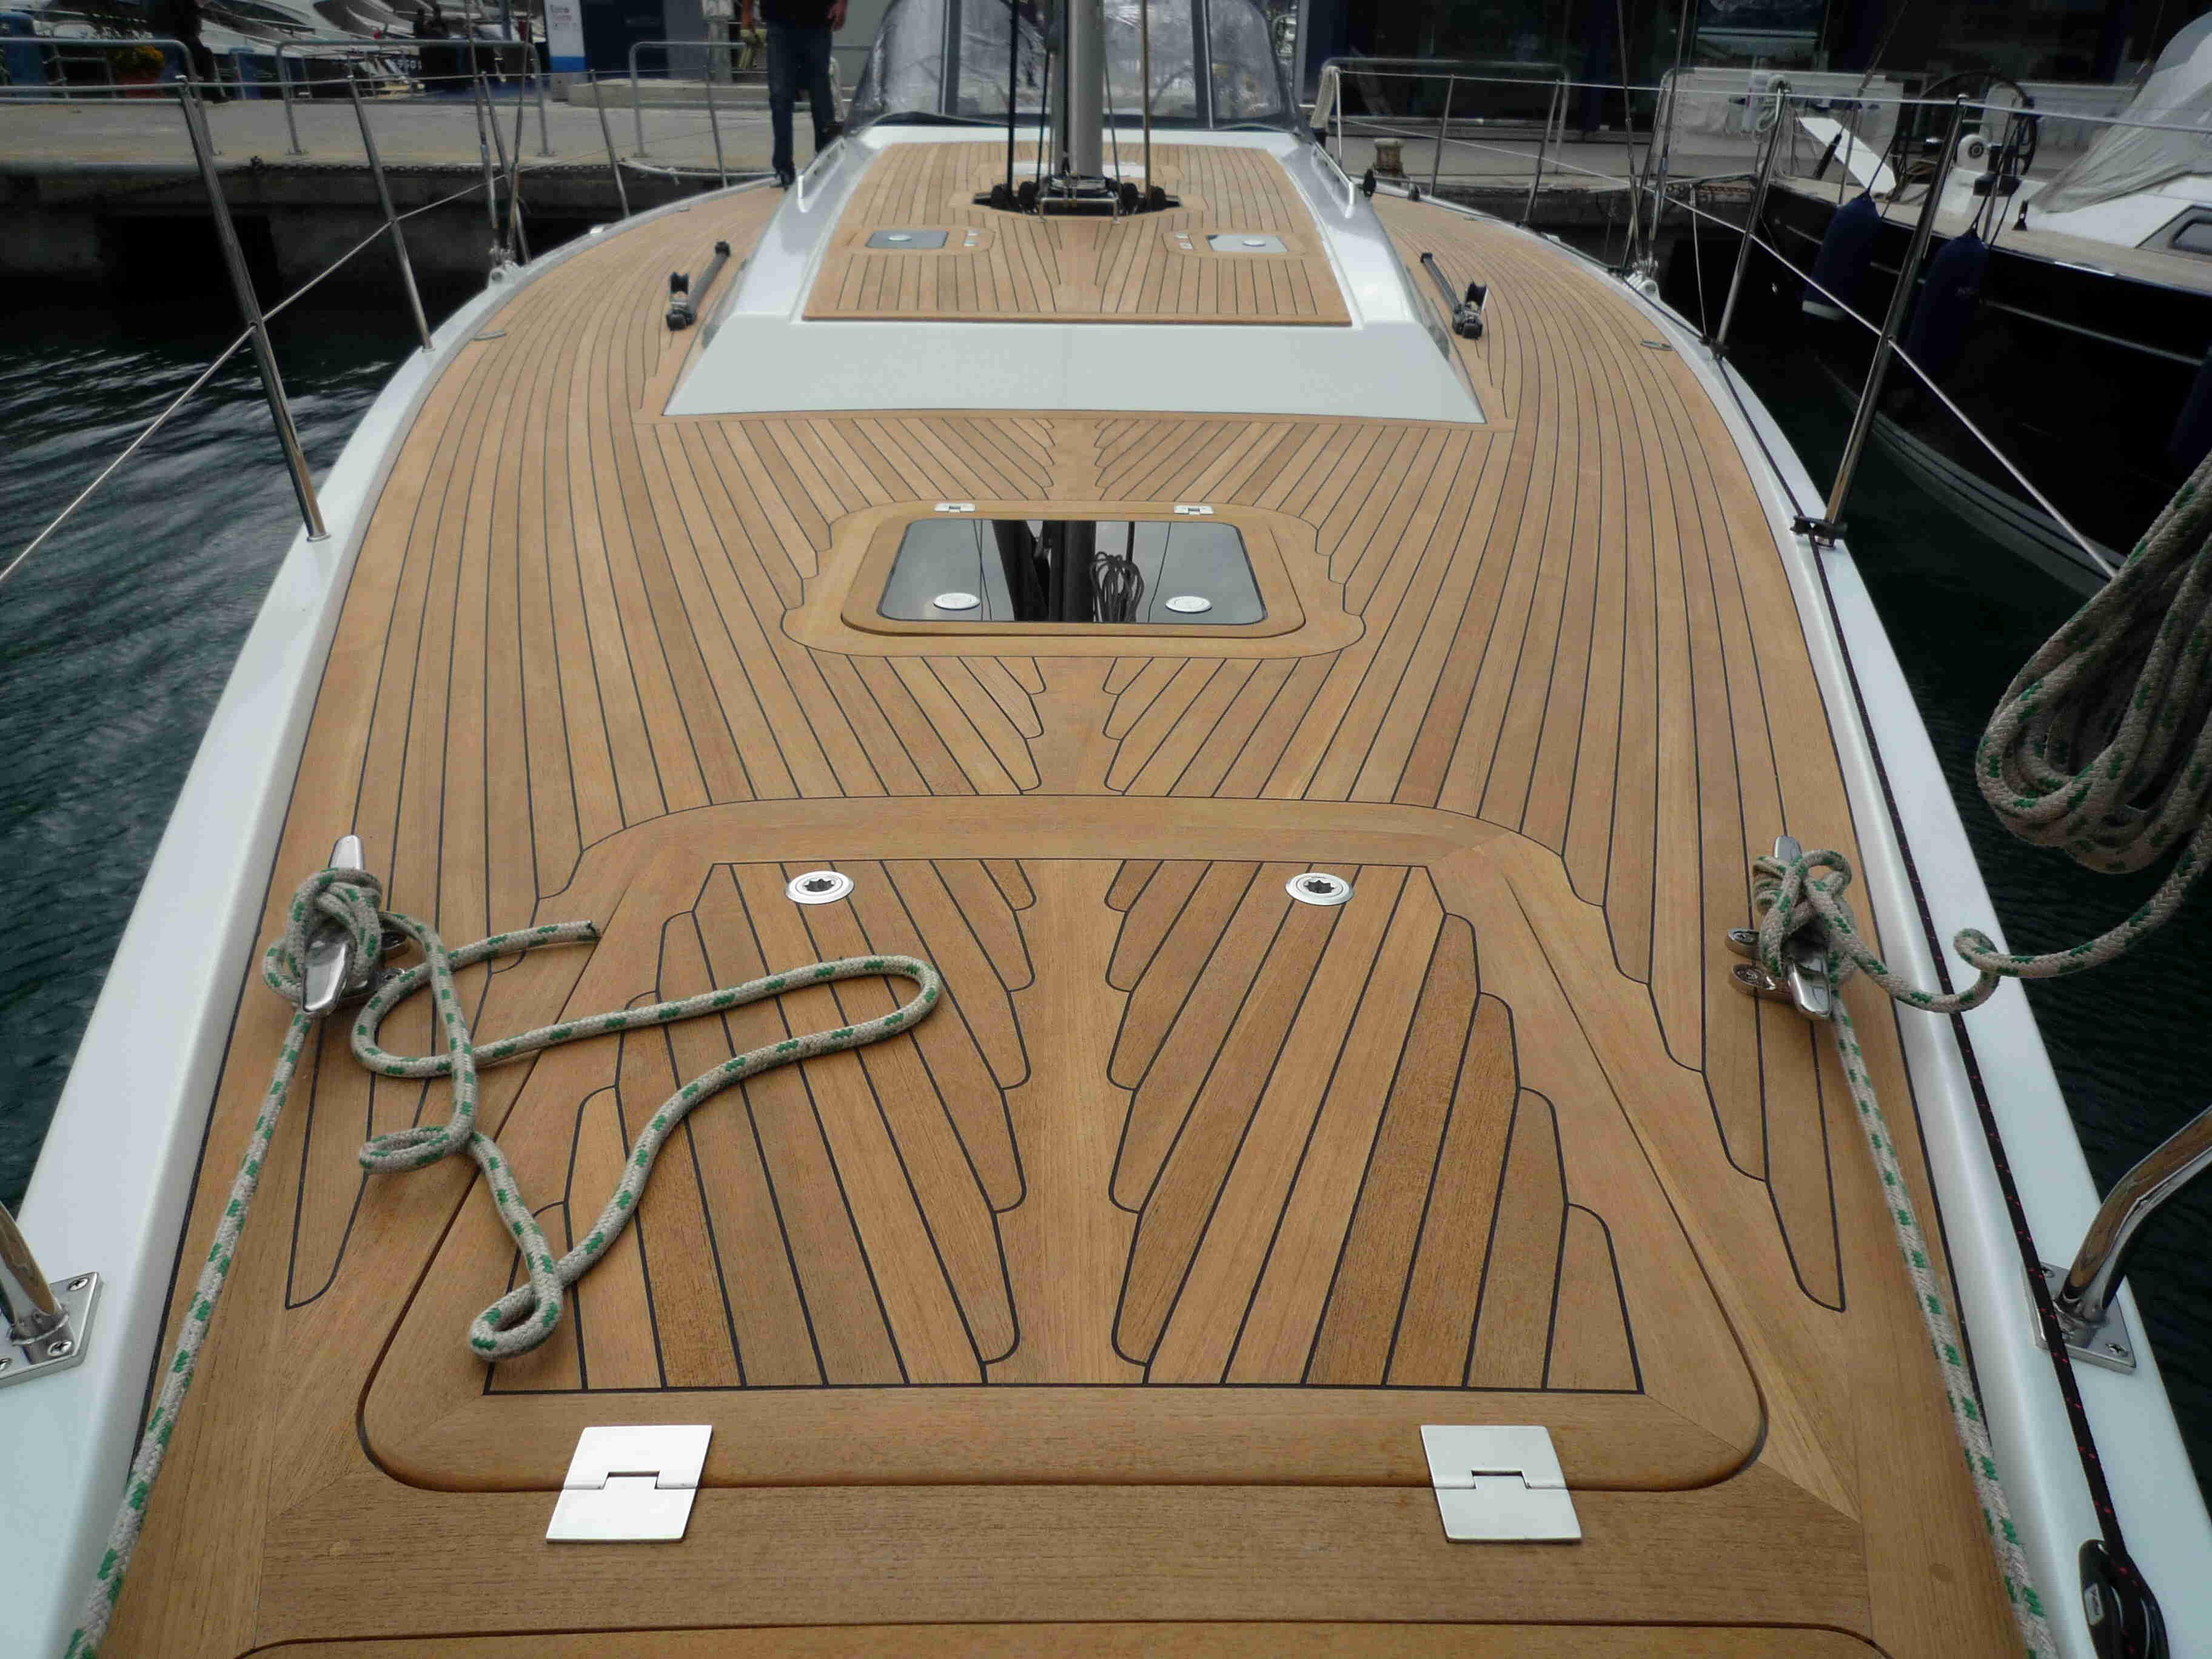 Best Weatherproof Boat Flooring Material Waterproof Floor In Mauritius